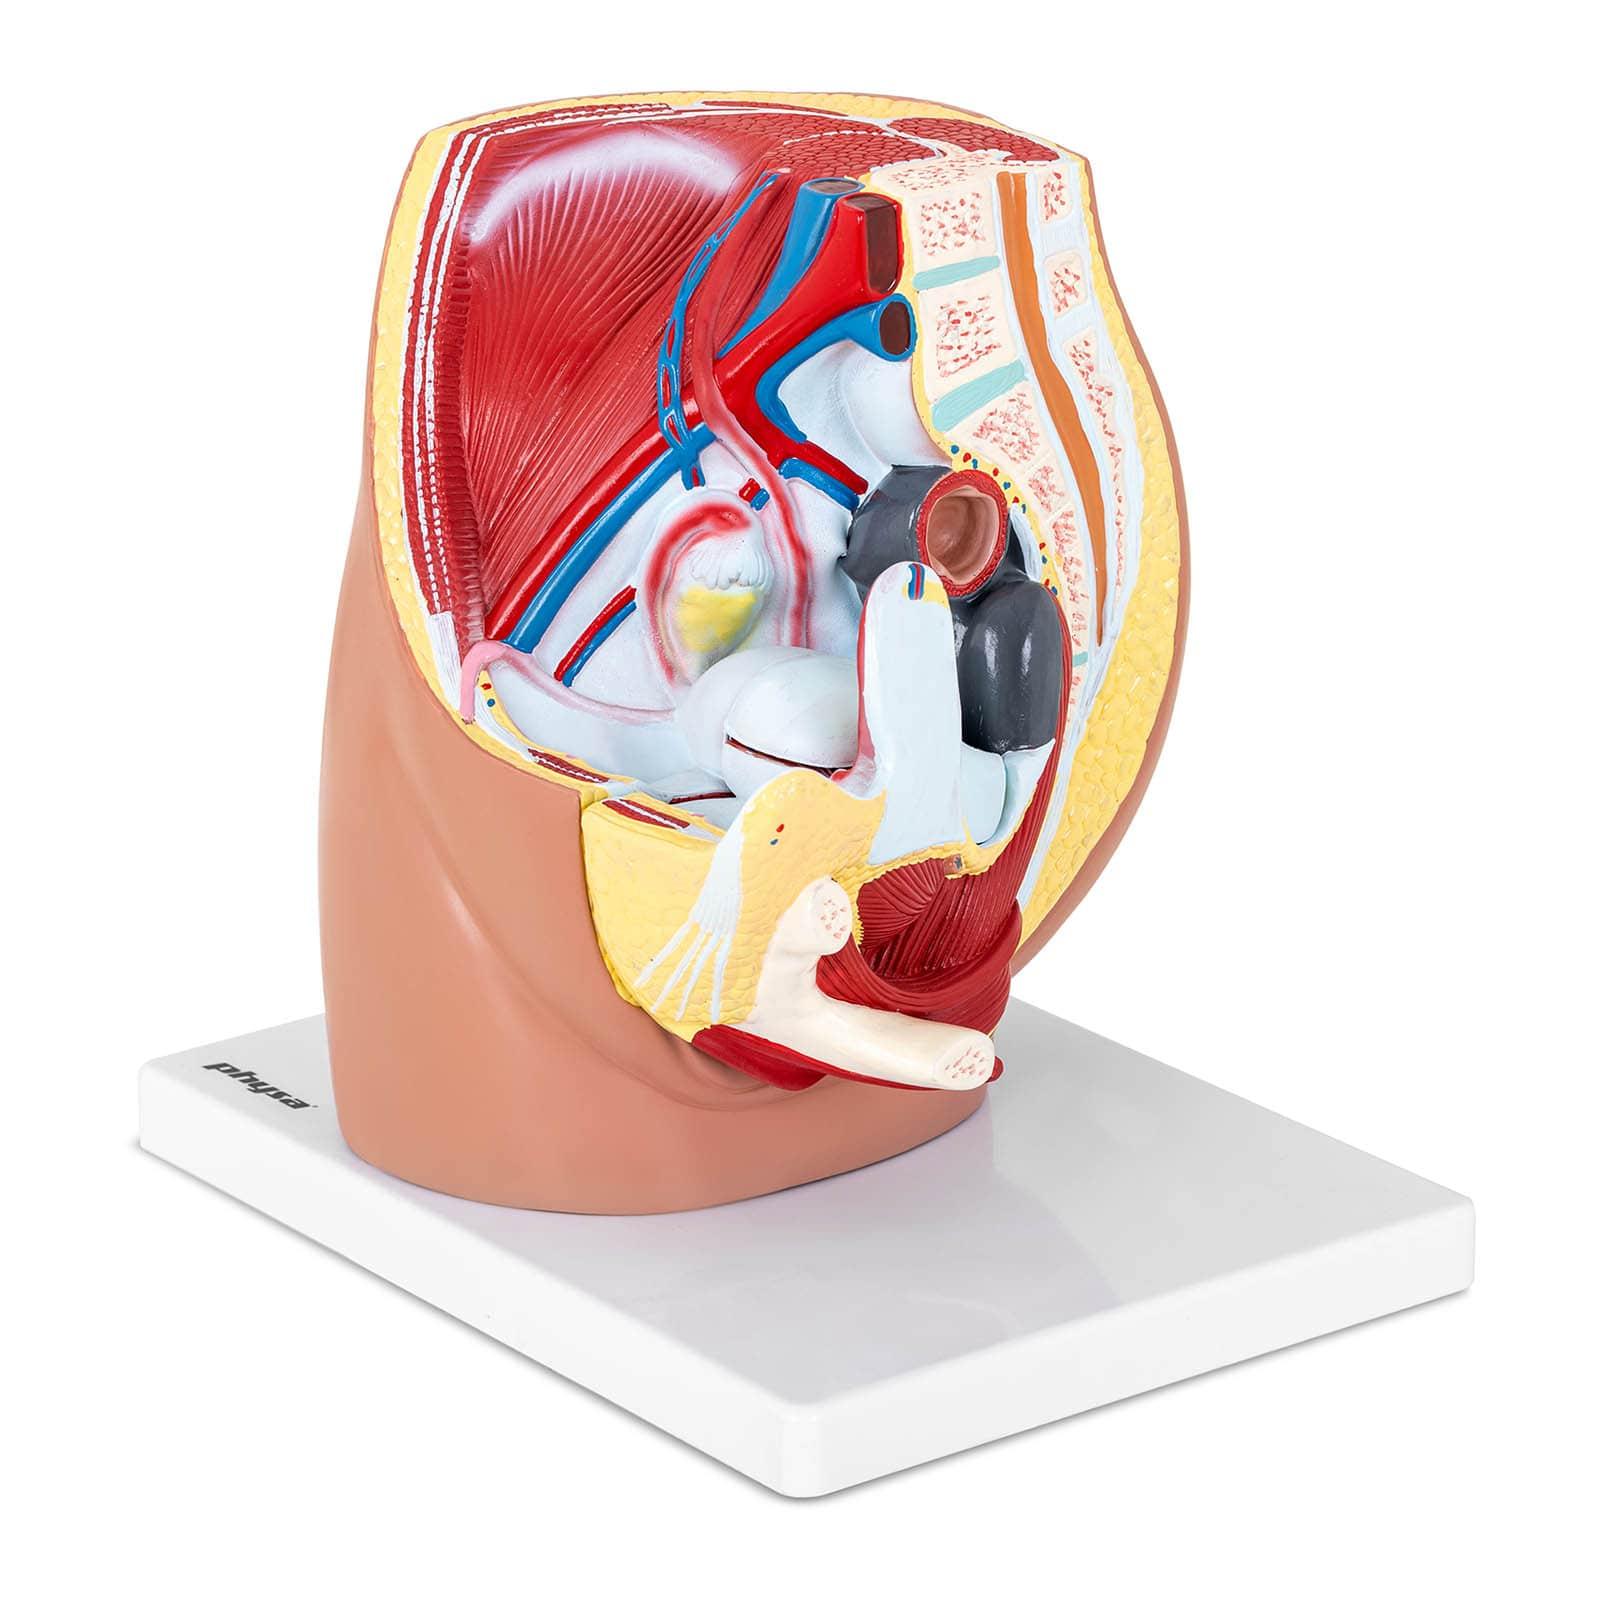 Model anatomiczny - miednica żeńska